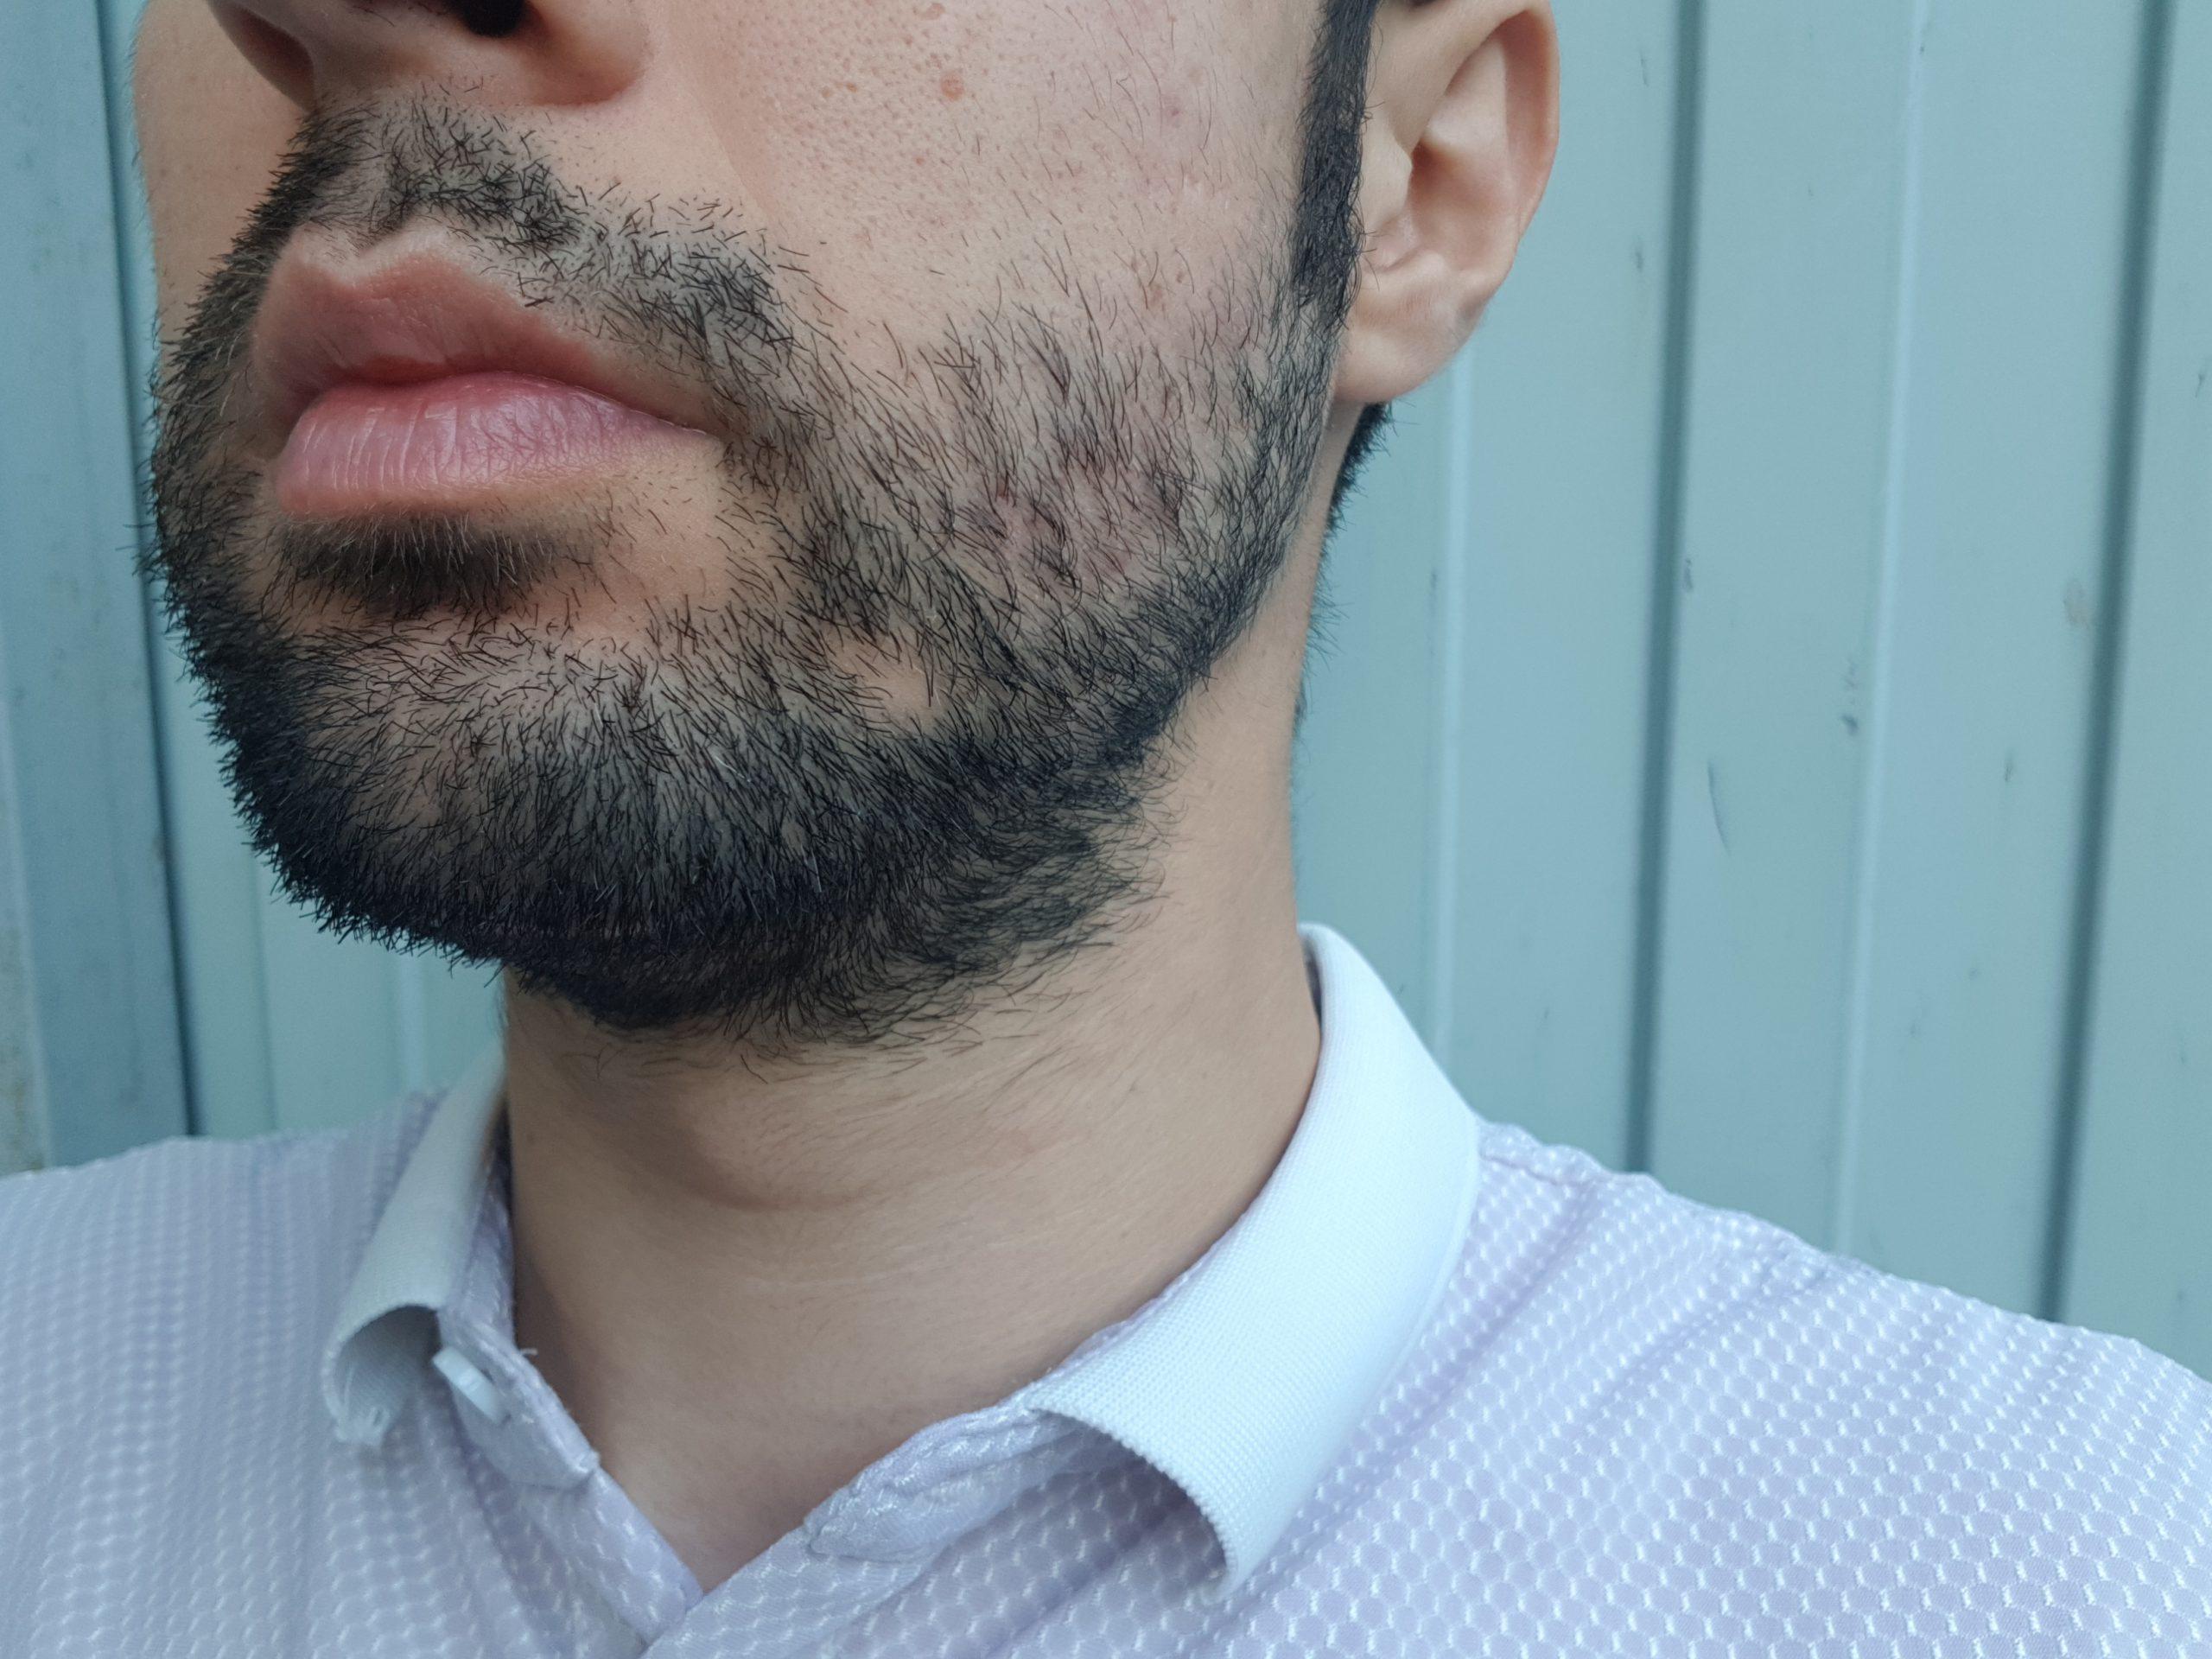 борода растет клочками